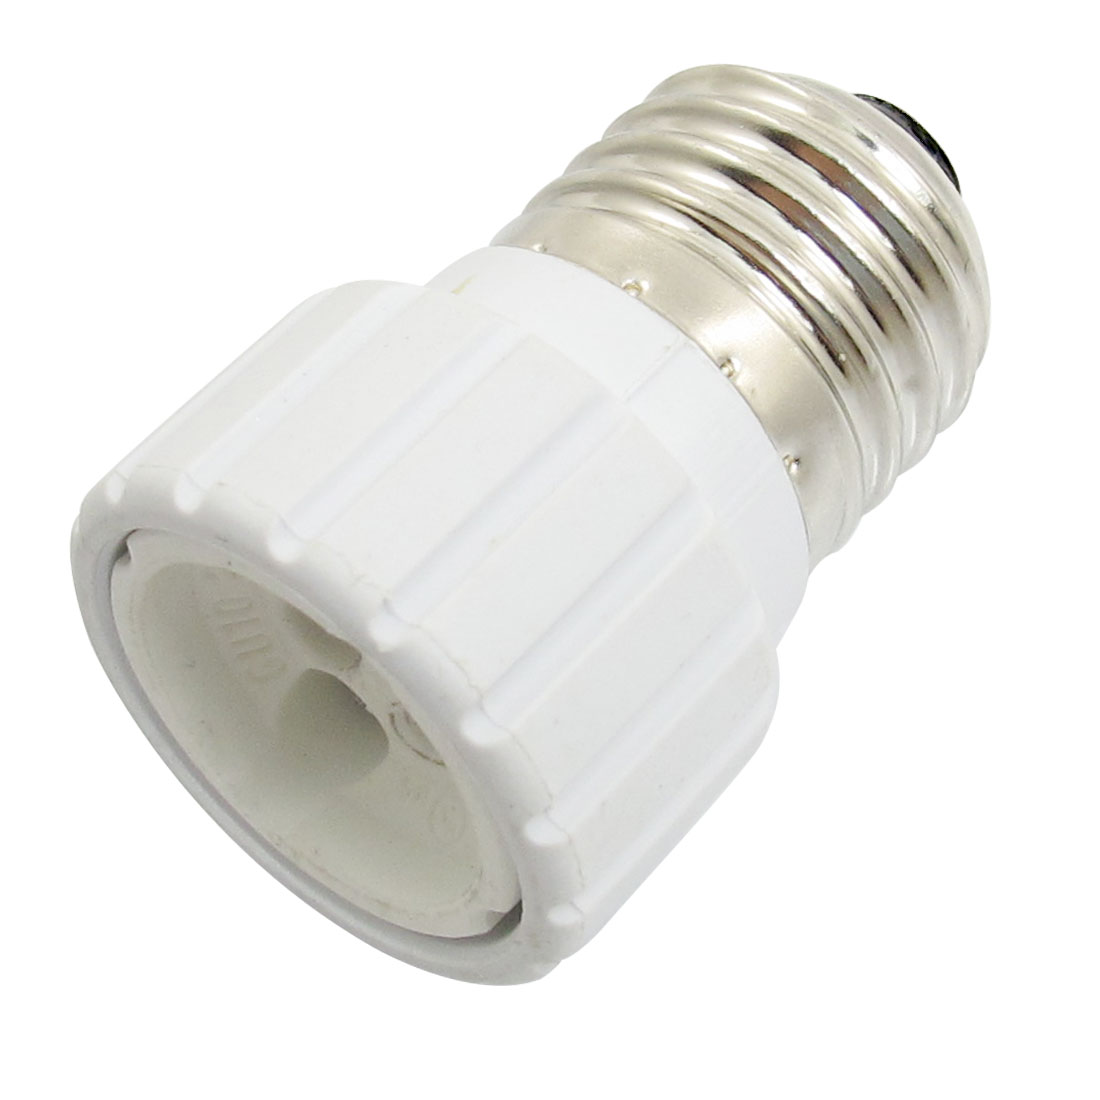 E27 to GU10 Base LED Light Lamp Bulb Adapter Socket Converter